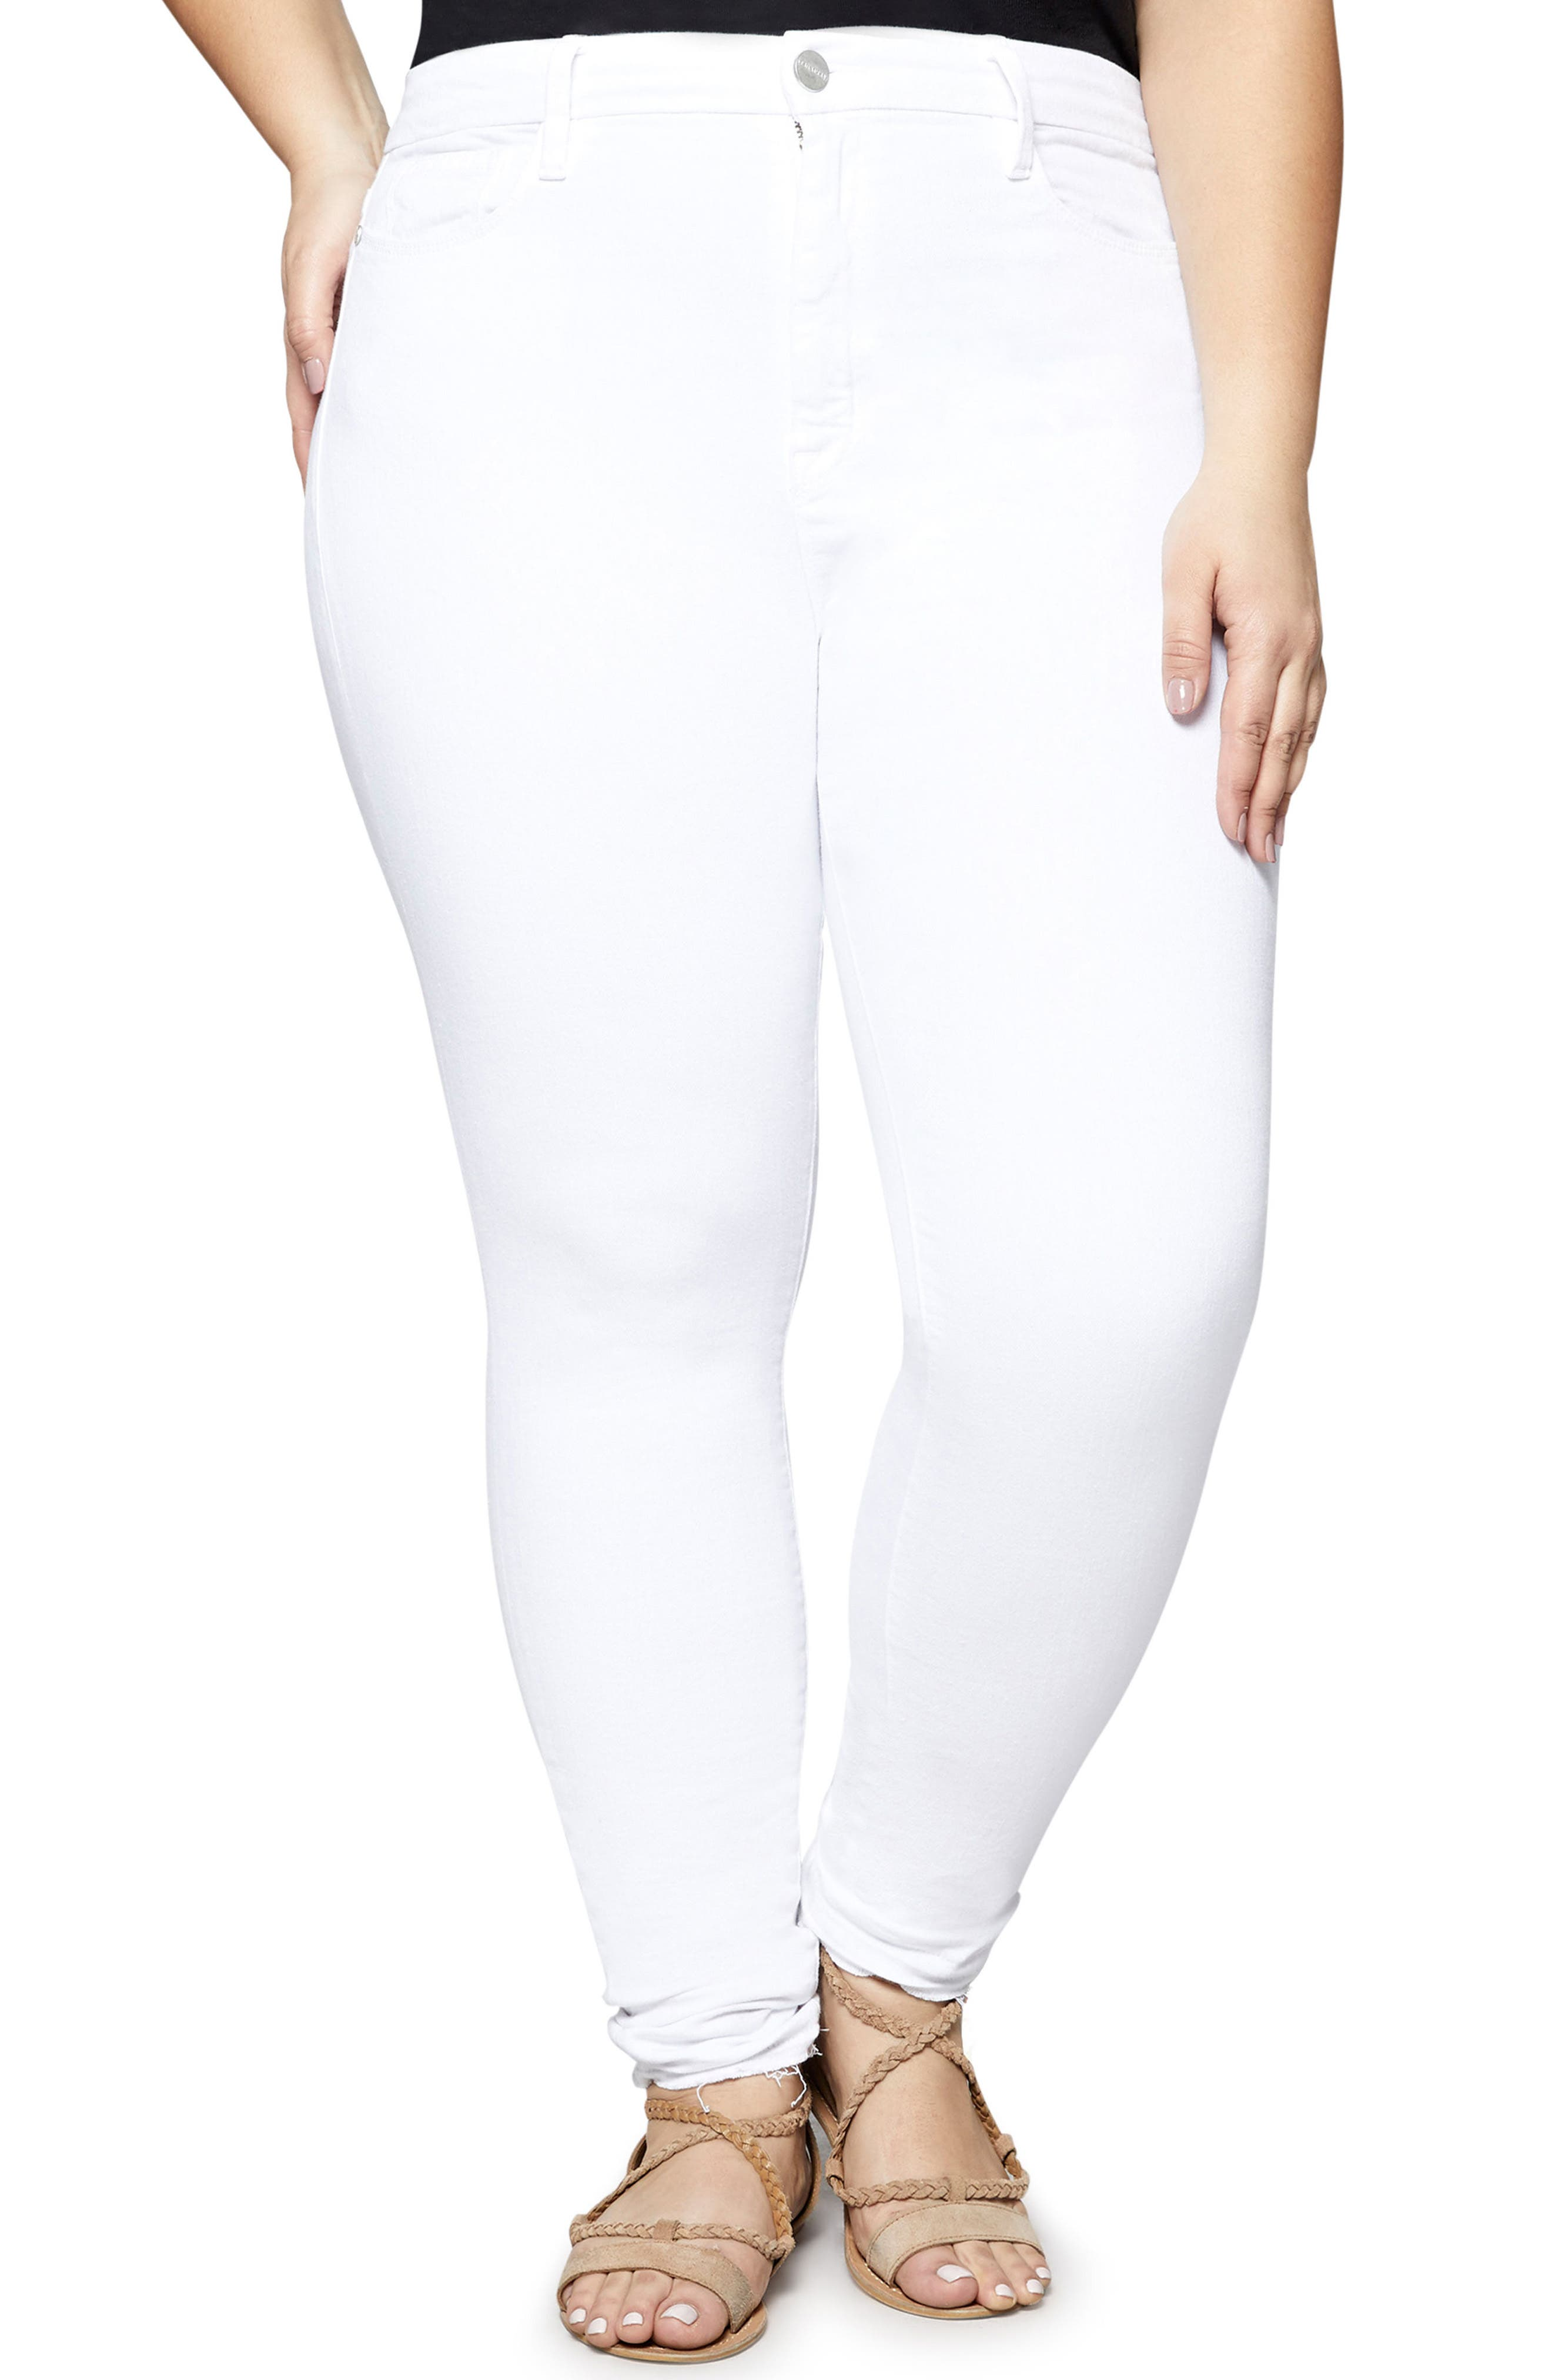 Saige Skinny Jeans,                         Main,                         color, White